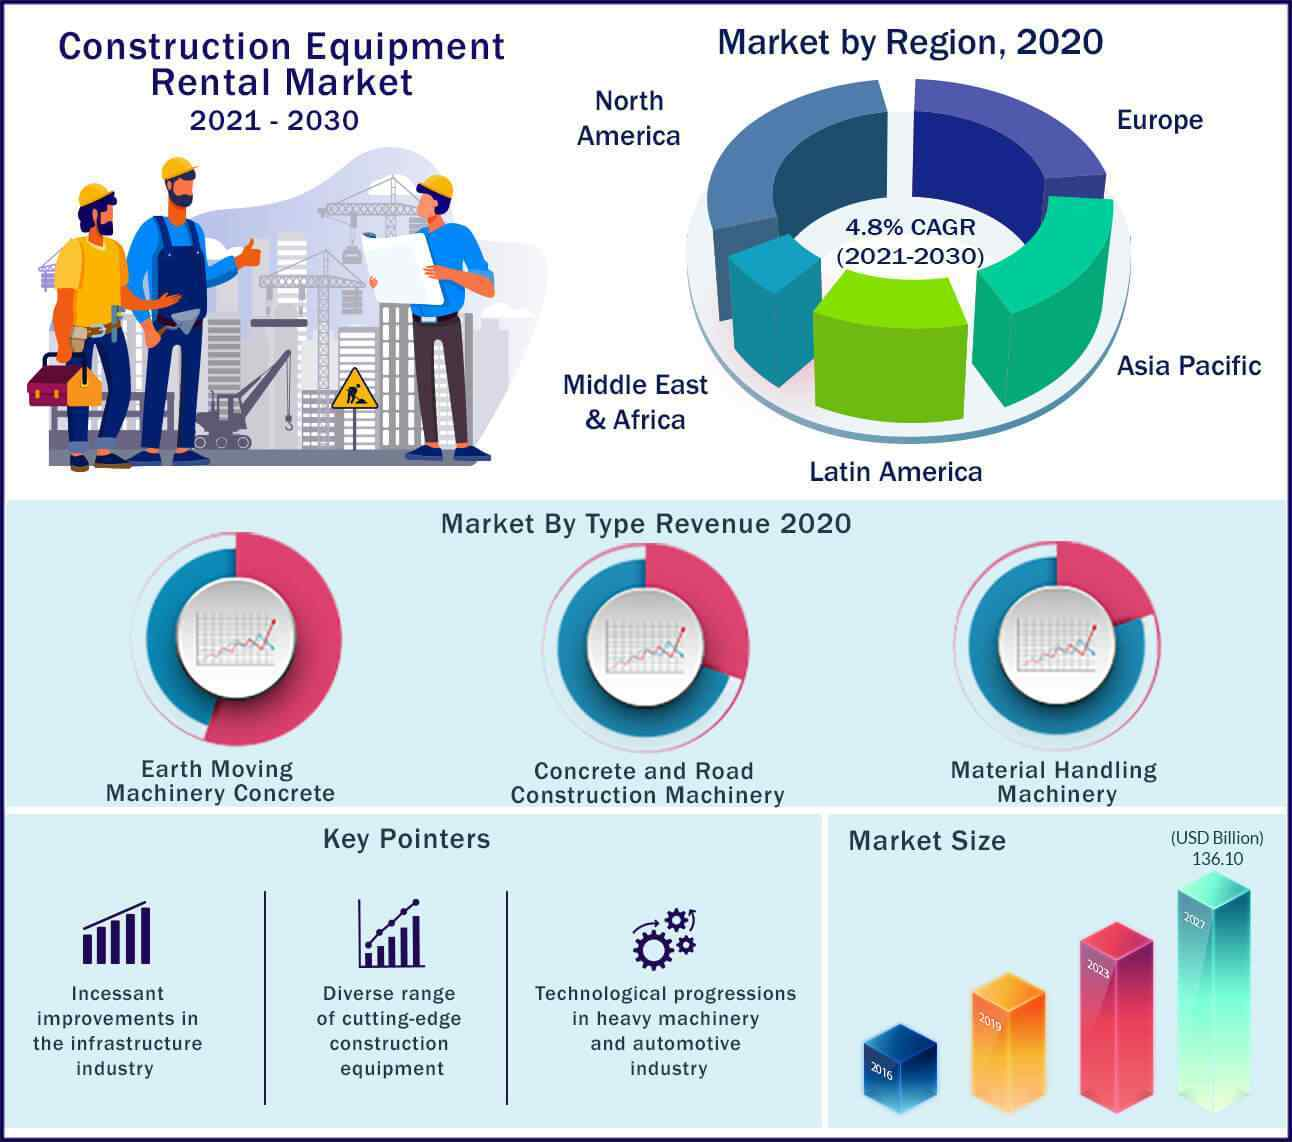 Global Construction Equipment Rental Market 2020 to 2027